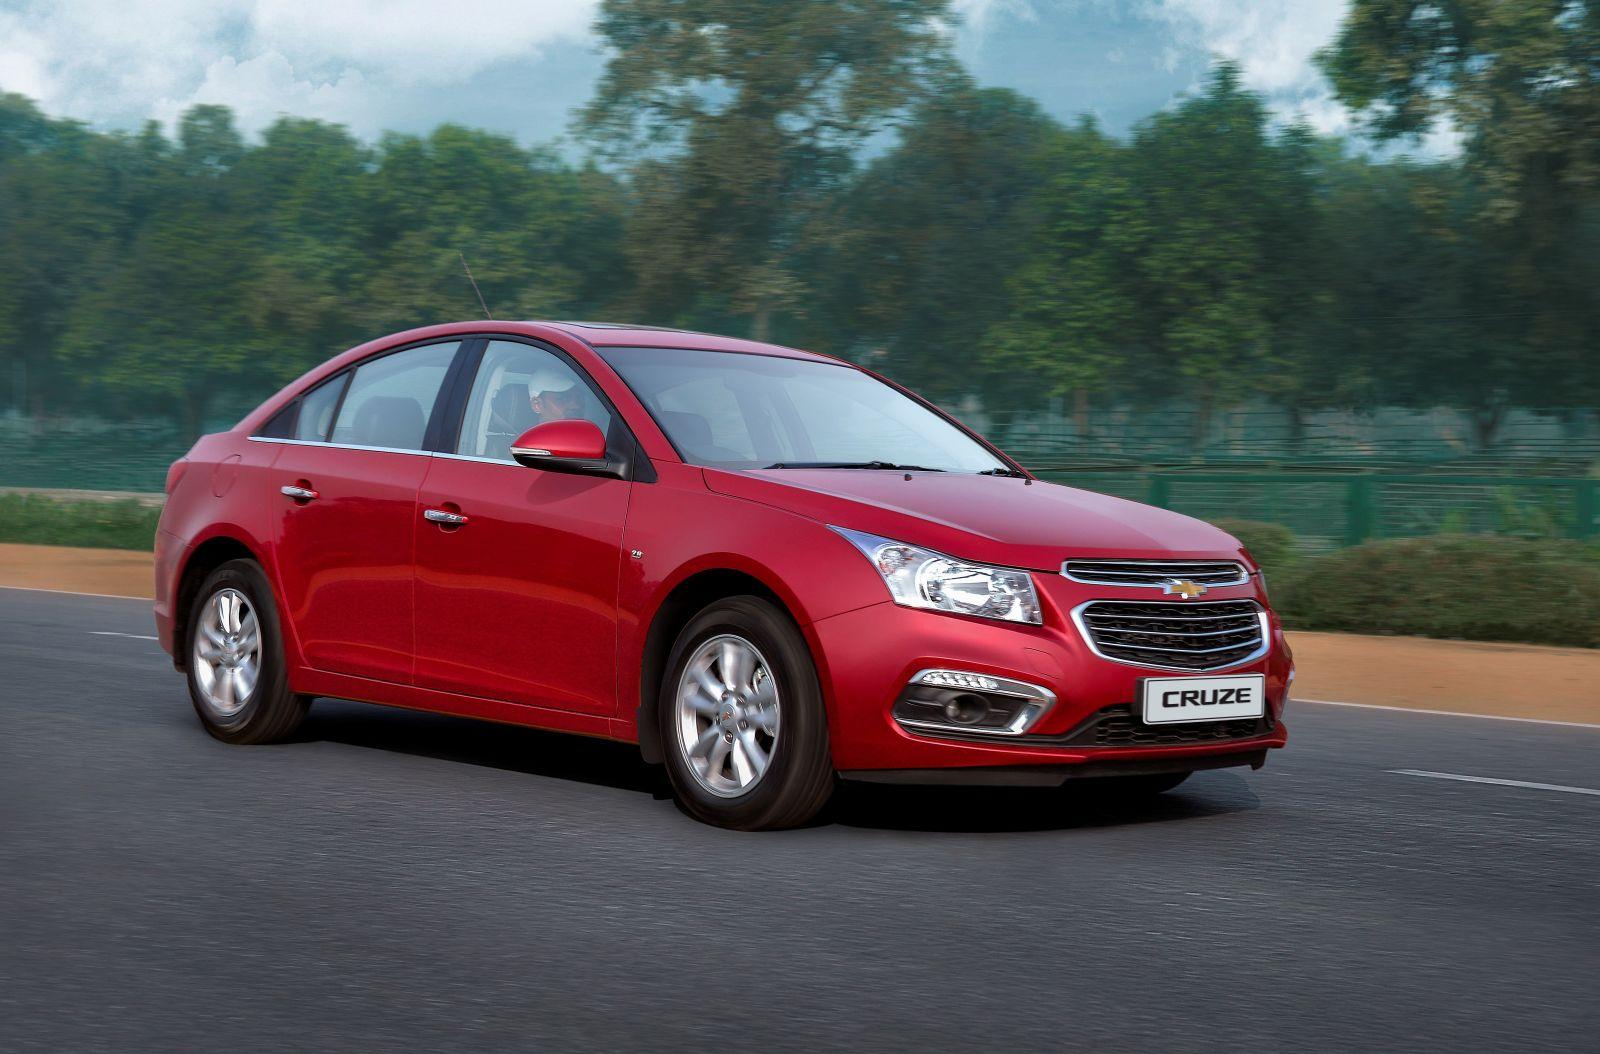 General Motors India Inaugurates New 3s Facility In Andhra